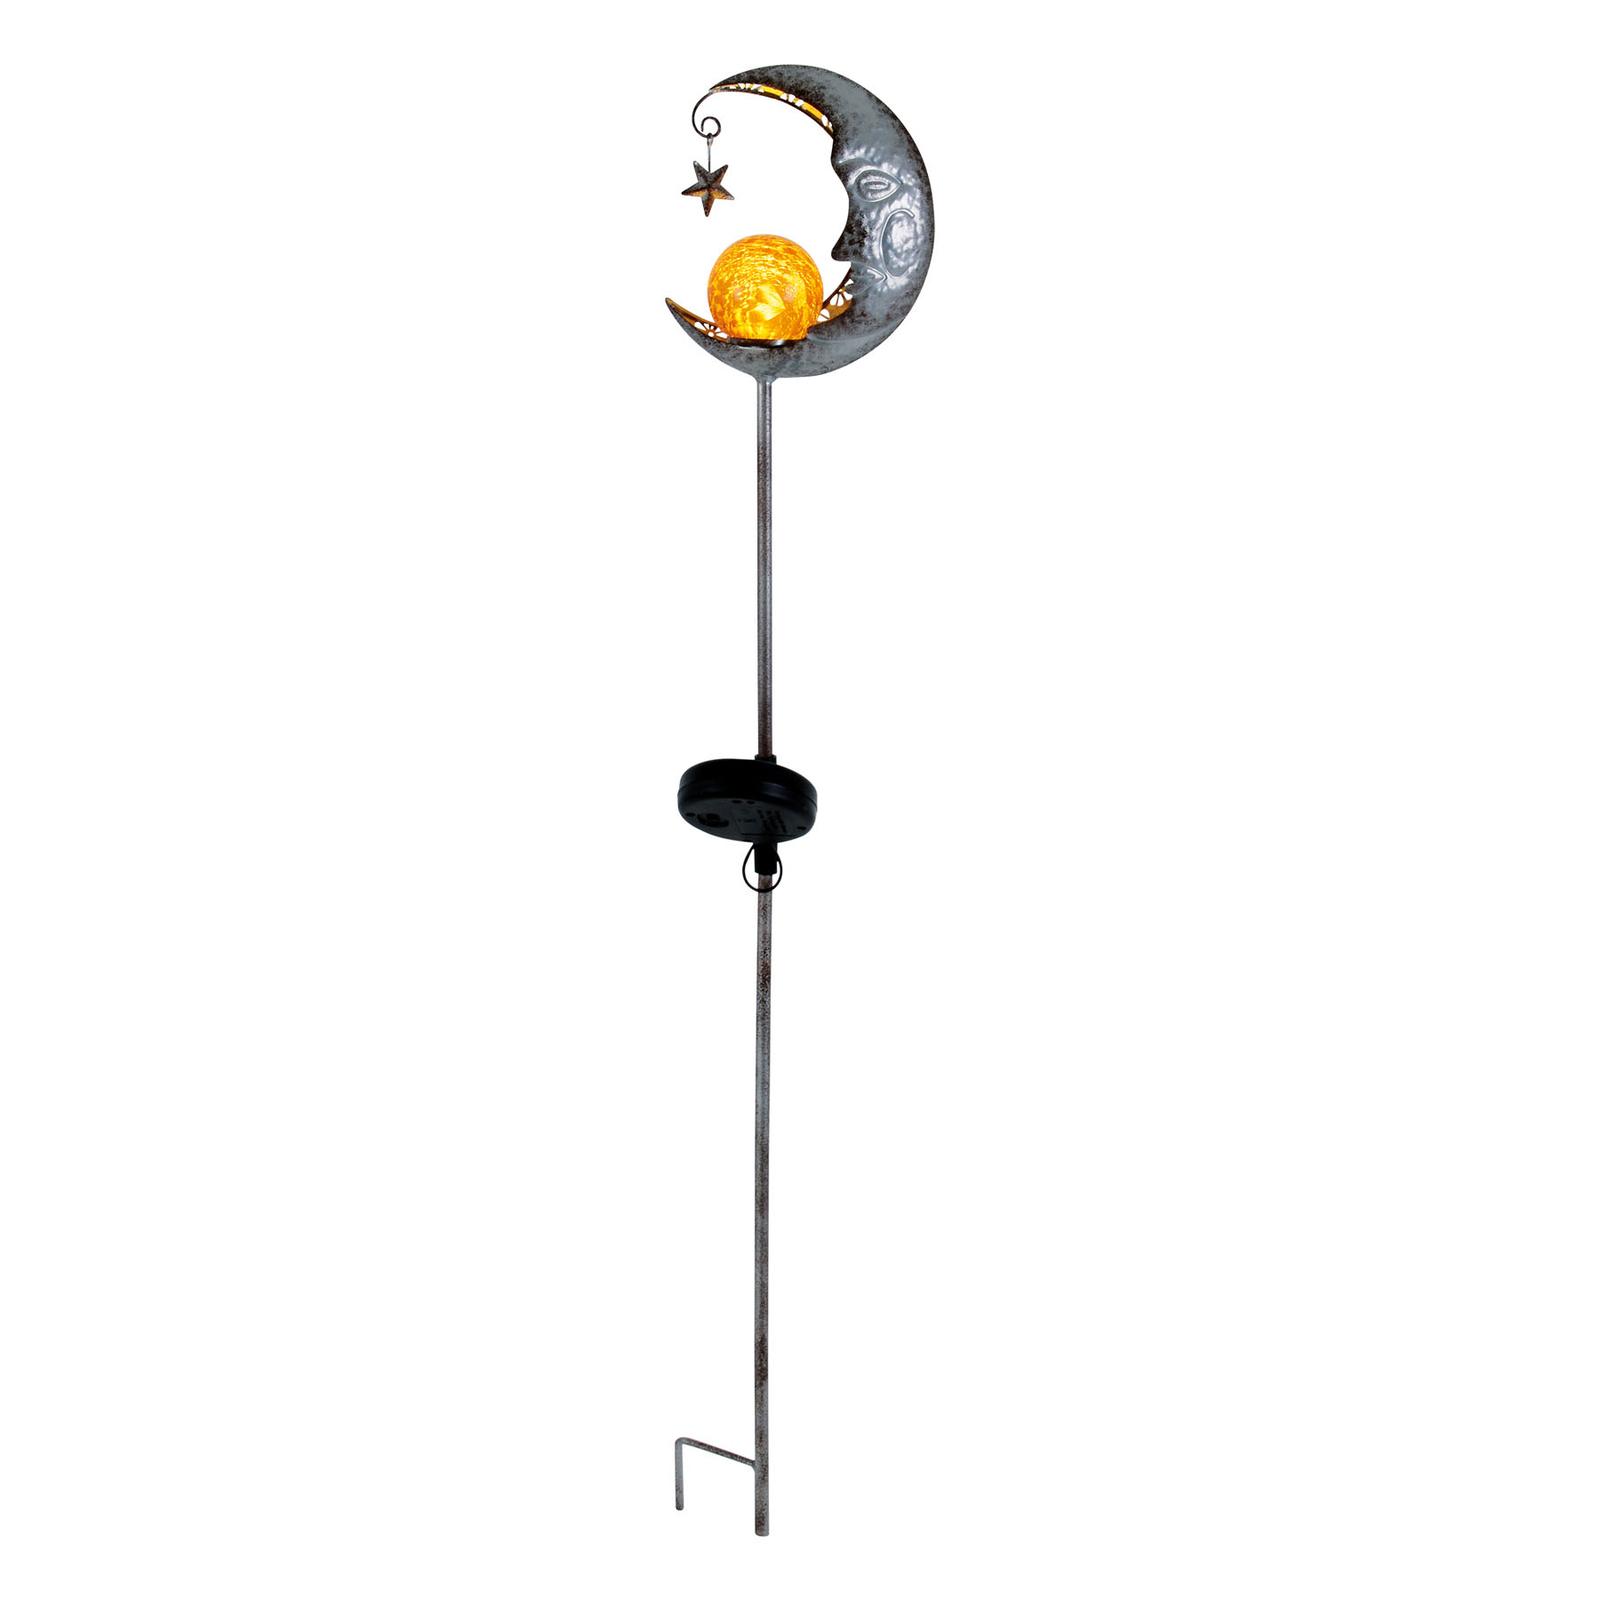 LED-solcellslampa Mond